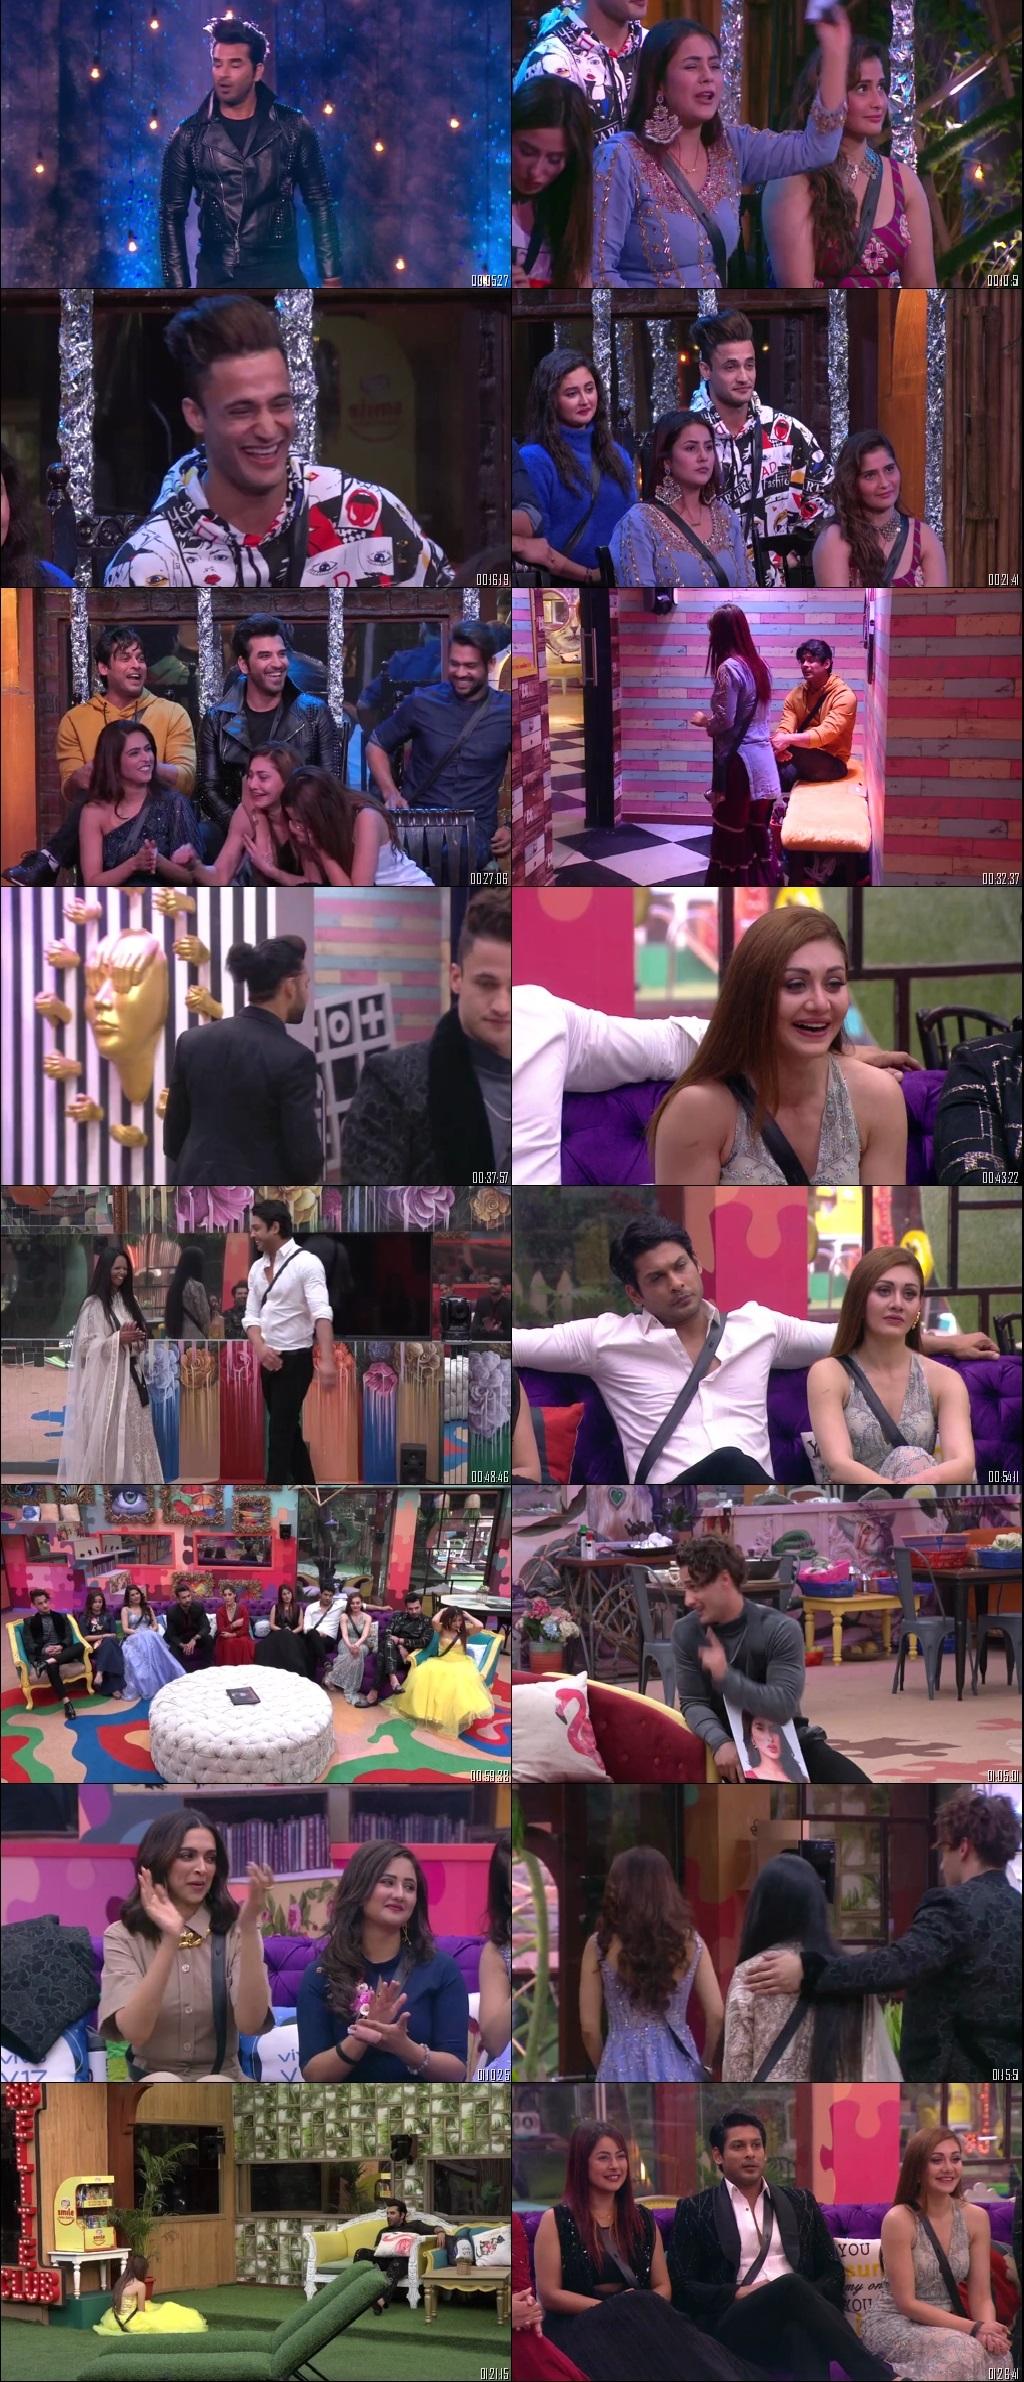 Screenshots Of Hindi Show Bigg Boss 13 11th January 2020 Episode 103 300MB 480P HD